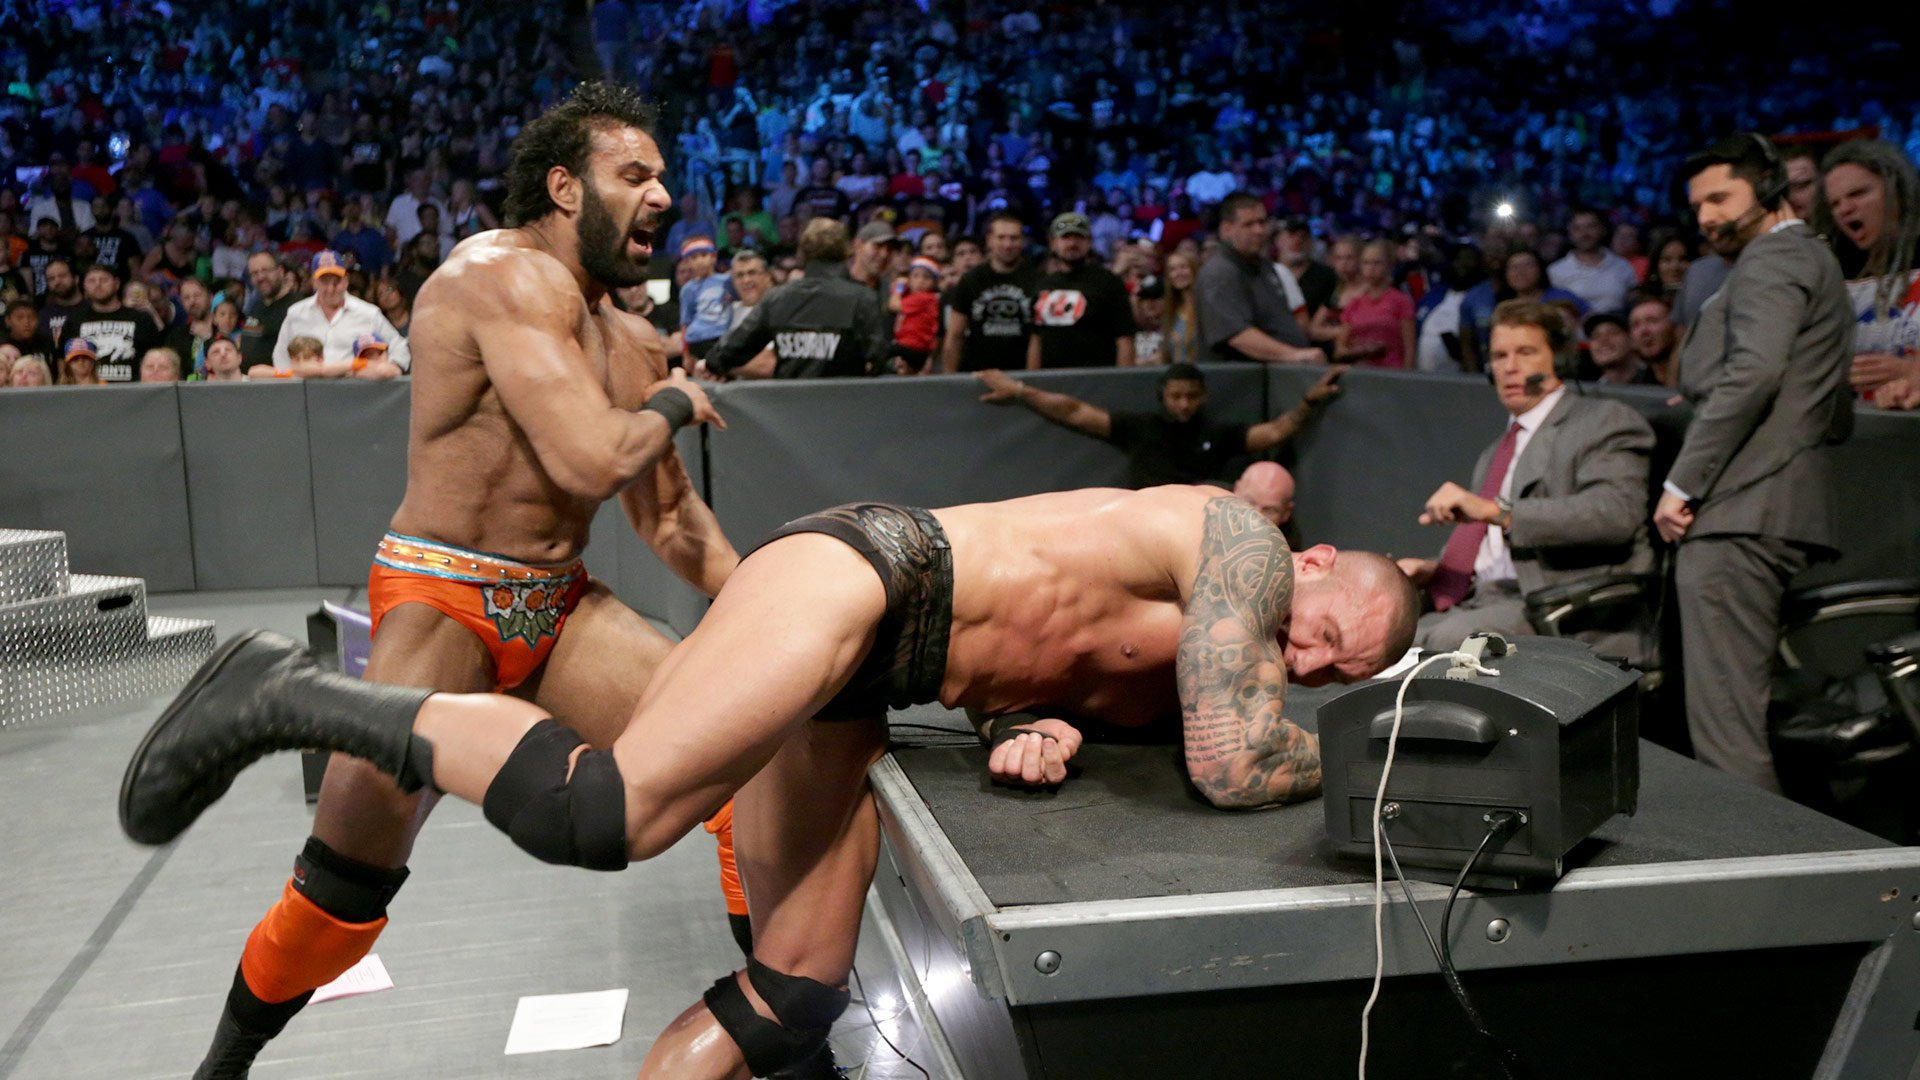 Randy Orton vs. Jinder Mahal: SmackDown LIVE 08.08.17